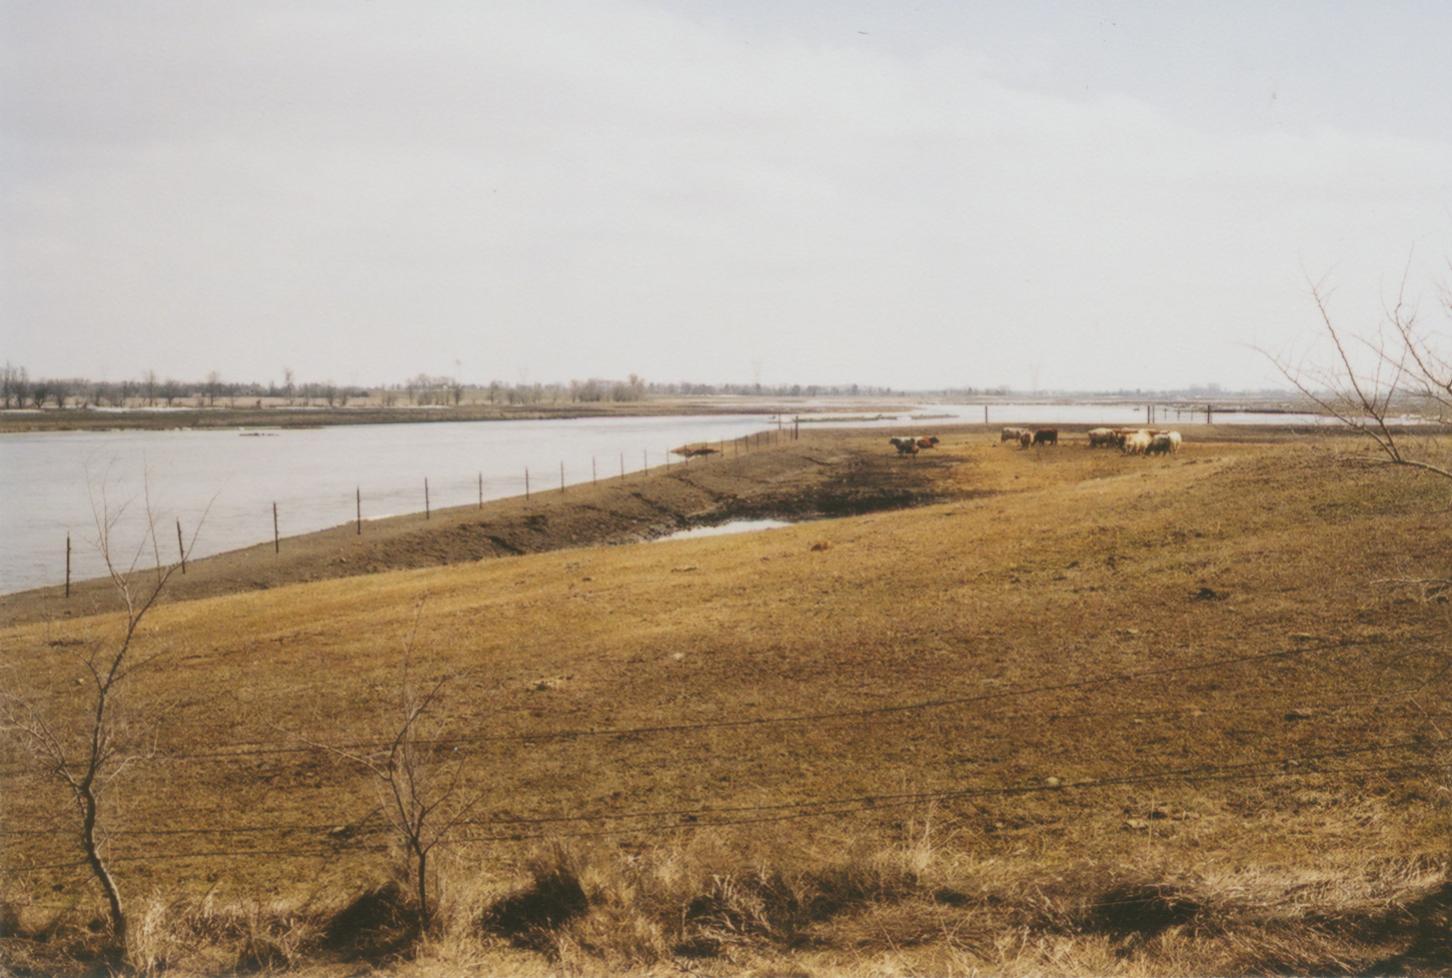 Clean water diverted around livestock pasture